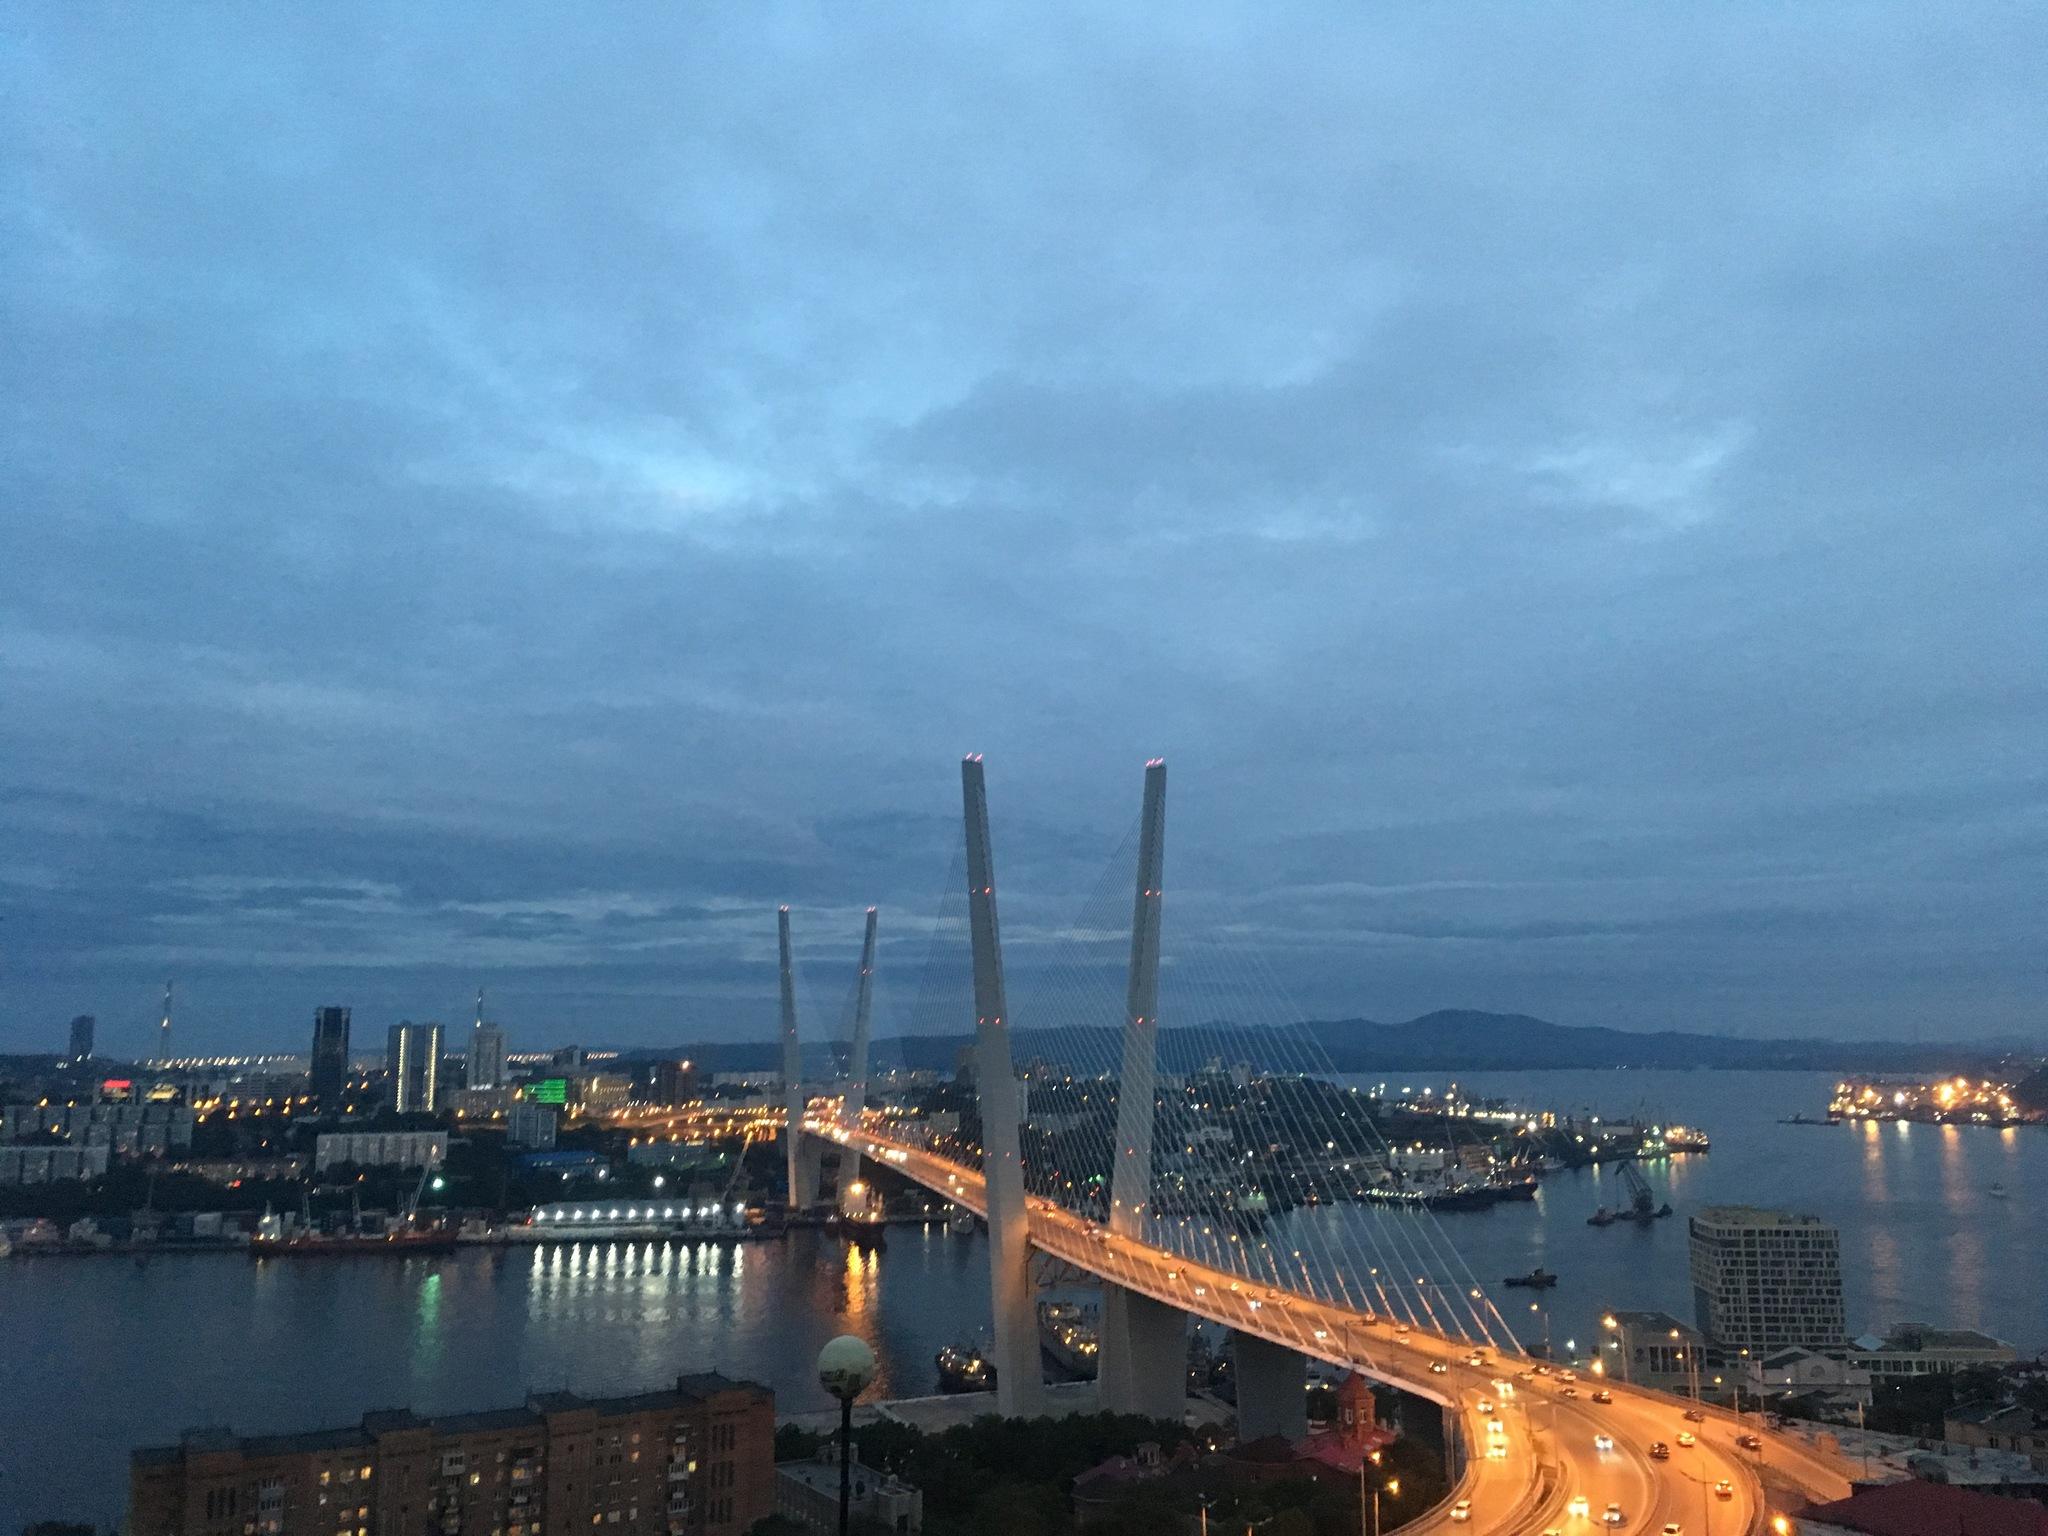 Обои дорожки, Корабли, Владивосток, сопки, дома, россия. Города foto 7